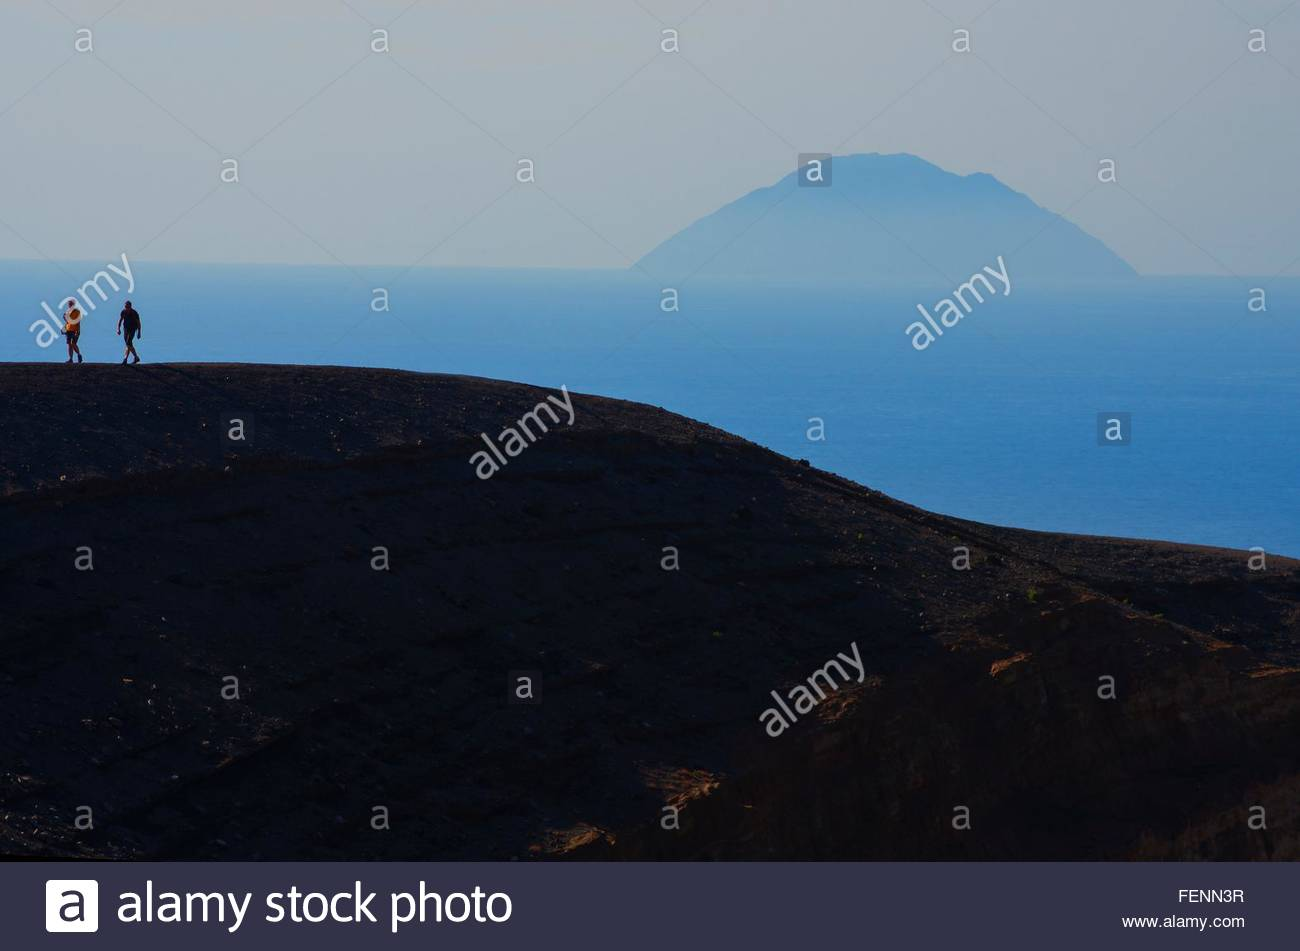 Zwei Silhouette Touristen Krater Felge, Vulcano Insel, Äolischen Inseln, Sizilien, Italien Stockbild